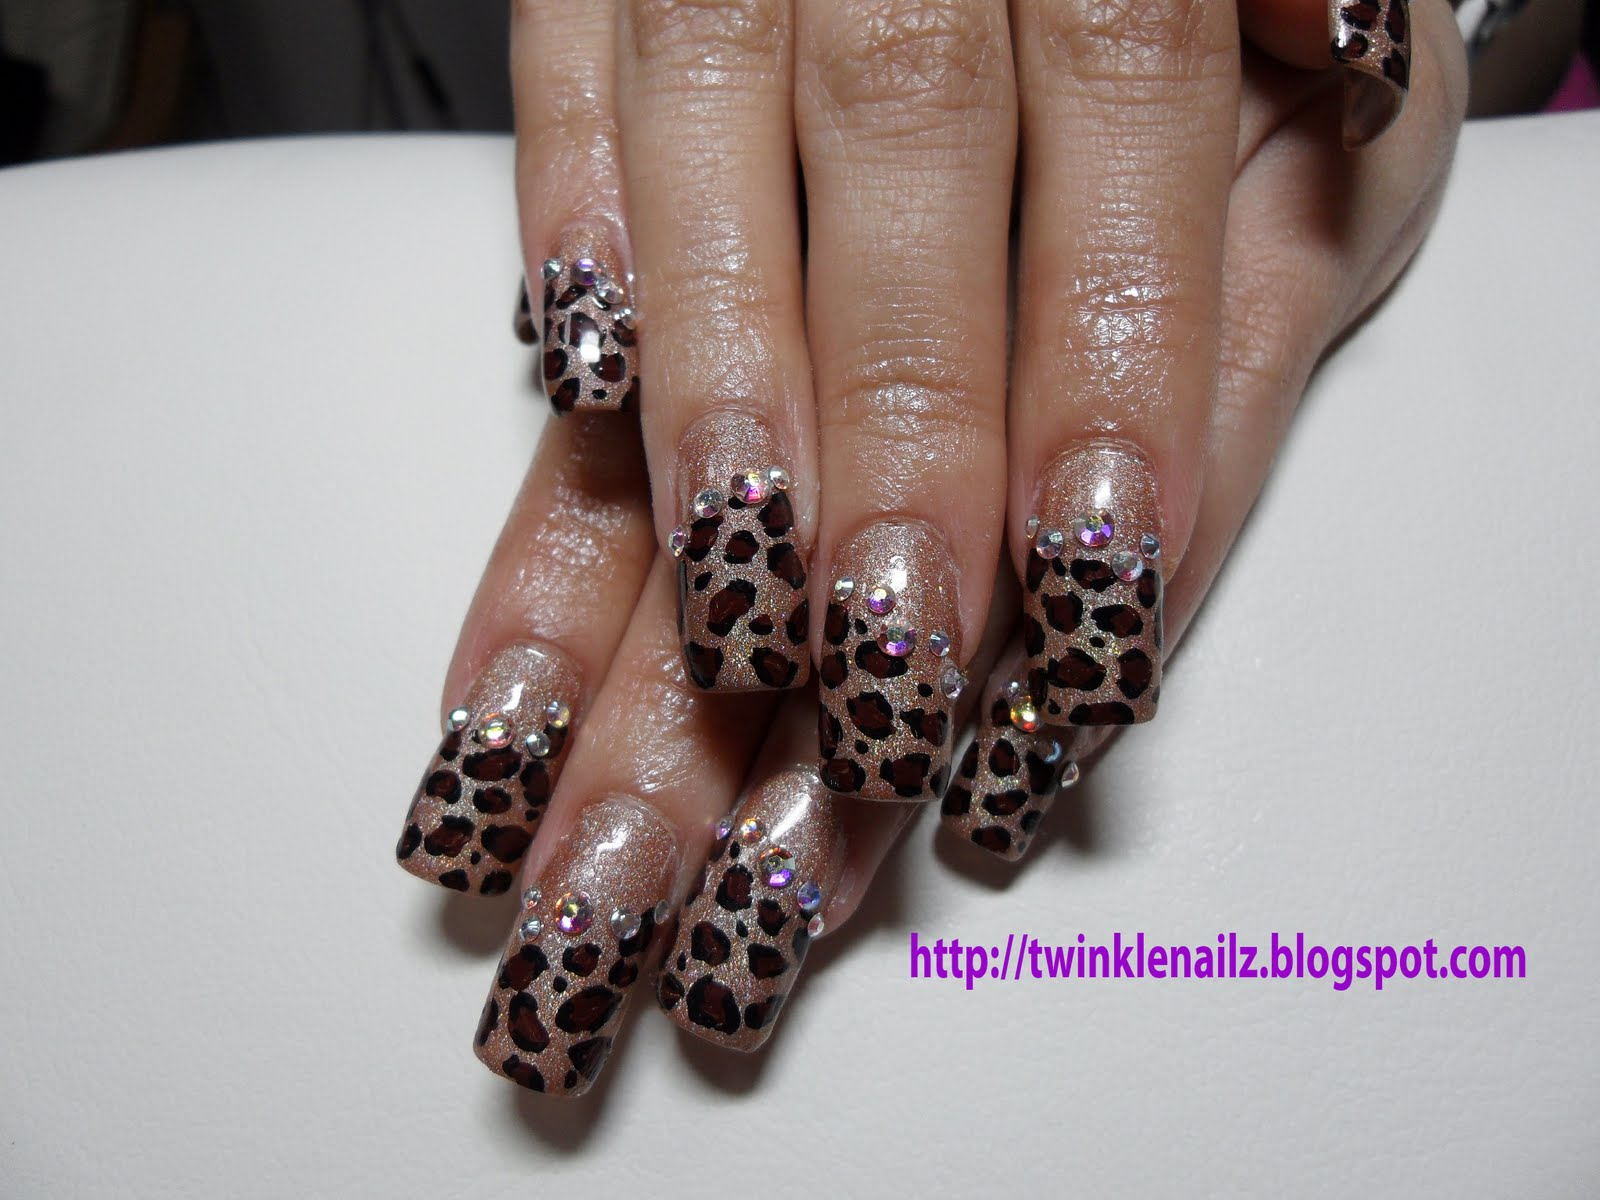 Acrylic Nails, inlay nail art - TWINKEL NAILZ